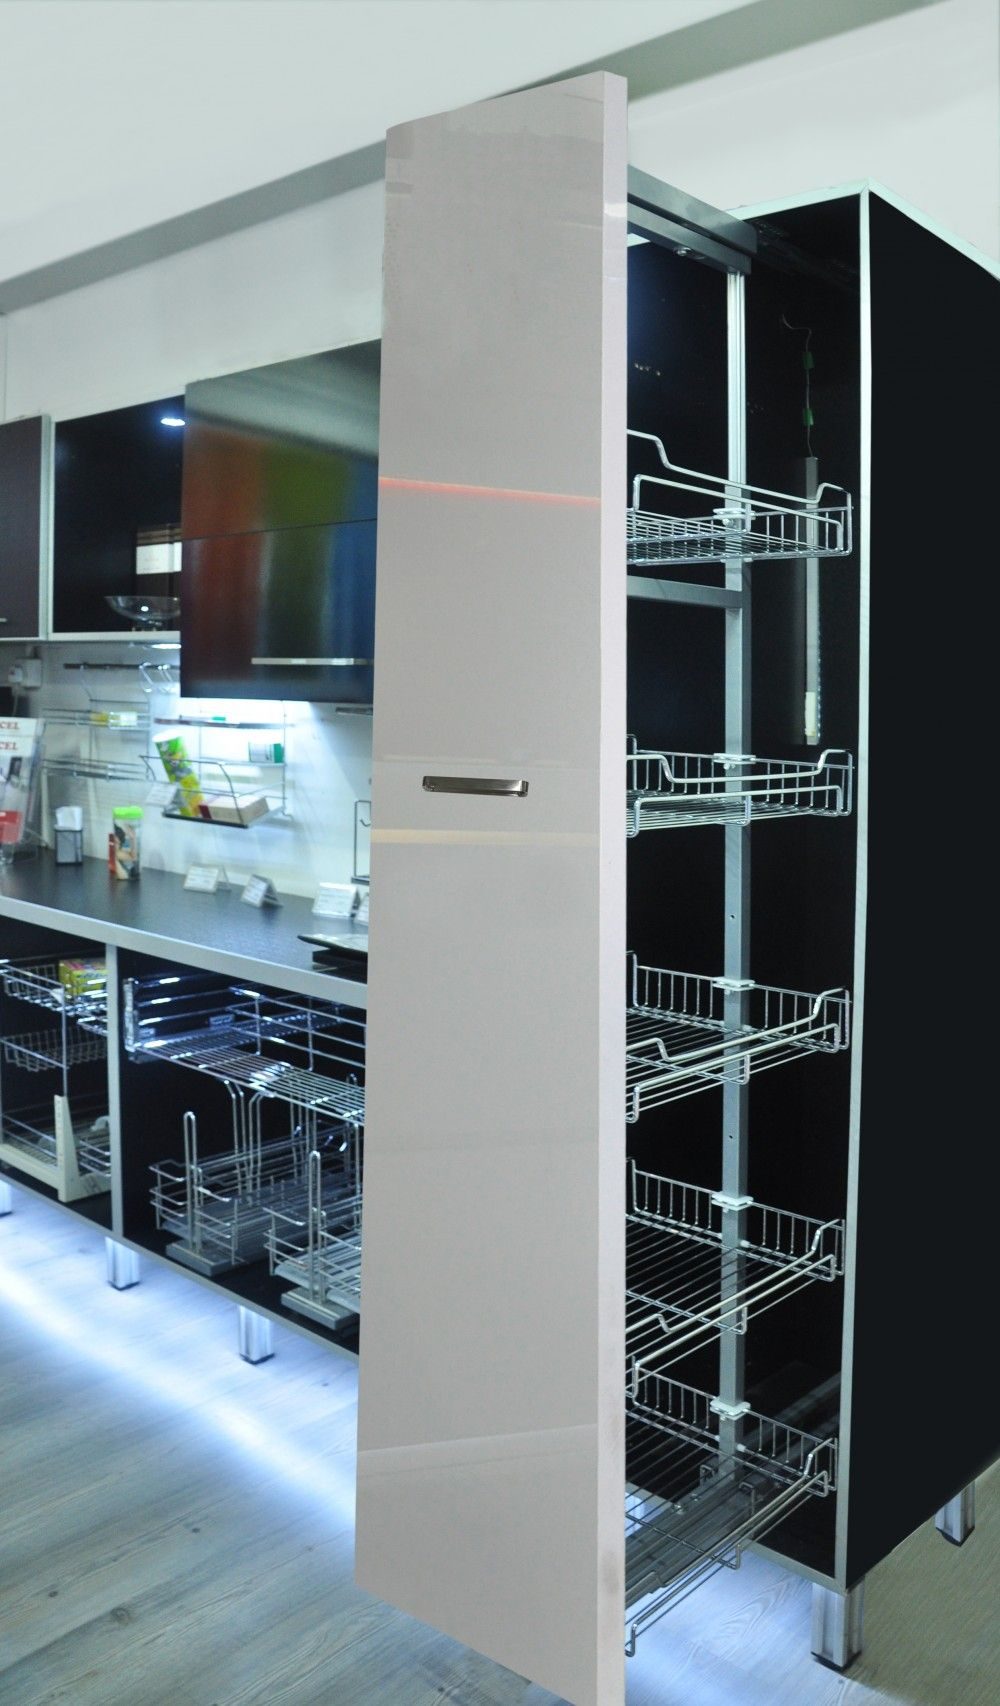 Excel Soft Closing Tall Unit With 5 Baskets Baskets Kitchen Basket Furniture Hardware Kitchen Baskets Kitchen Storage Rack Furniture Hardware